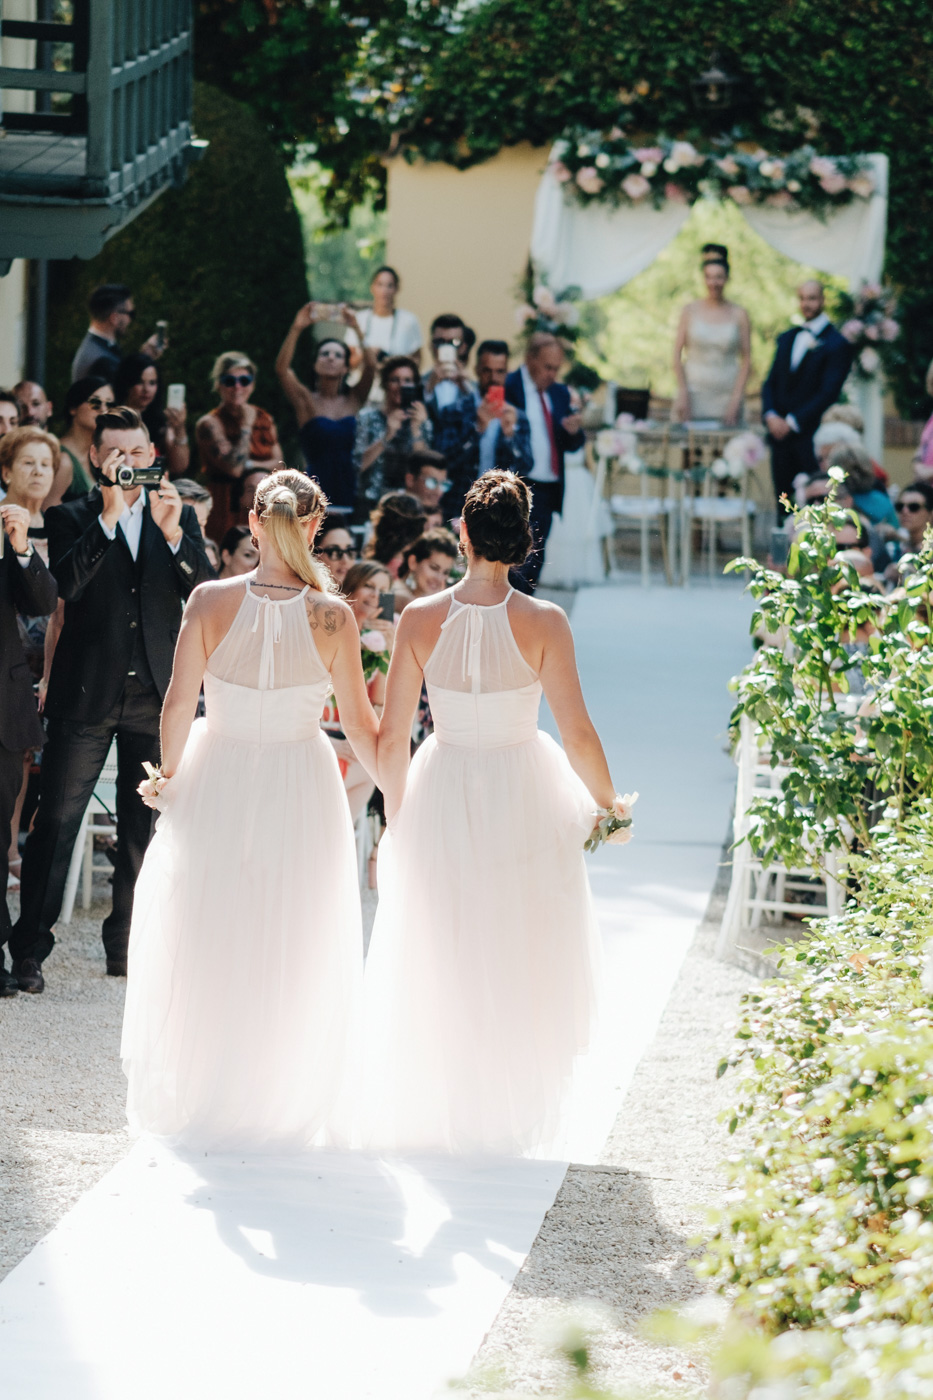 Matrimoni all'italiana wedding photographer italy-58.jpg